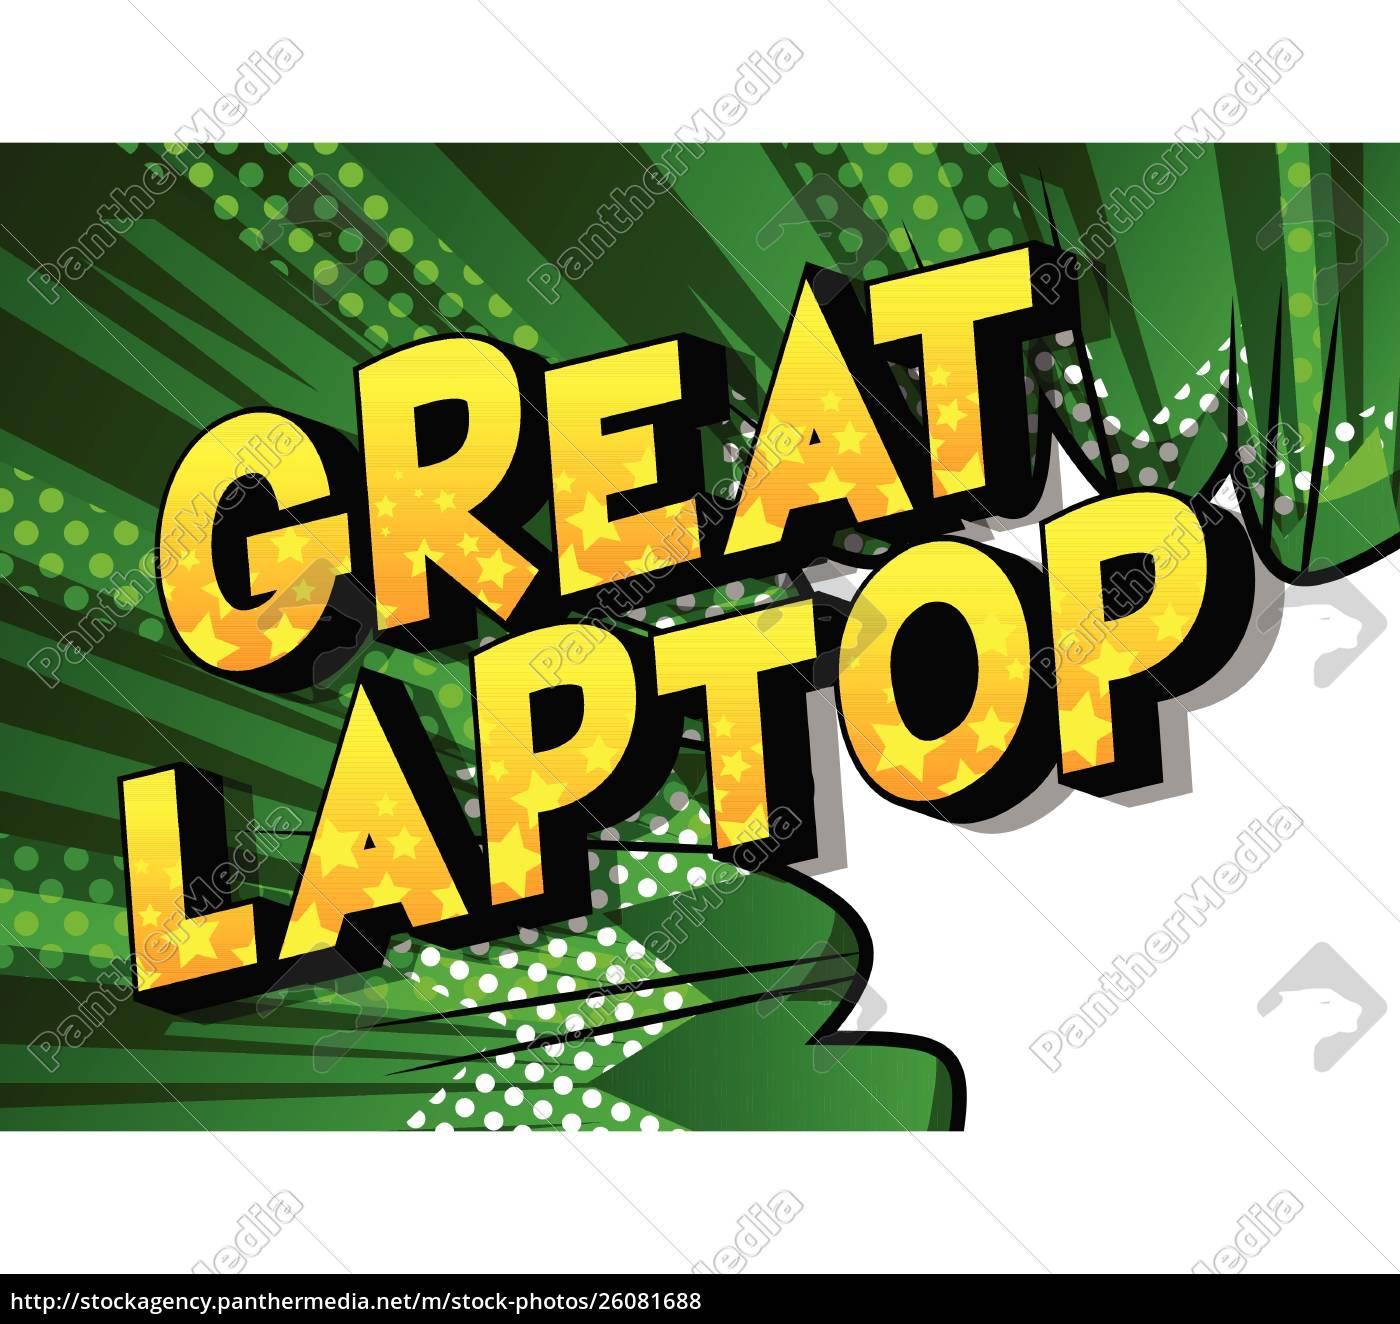 great, laptop-comic-buch-stil, wörter. - 26081688